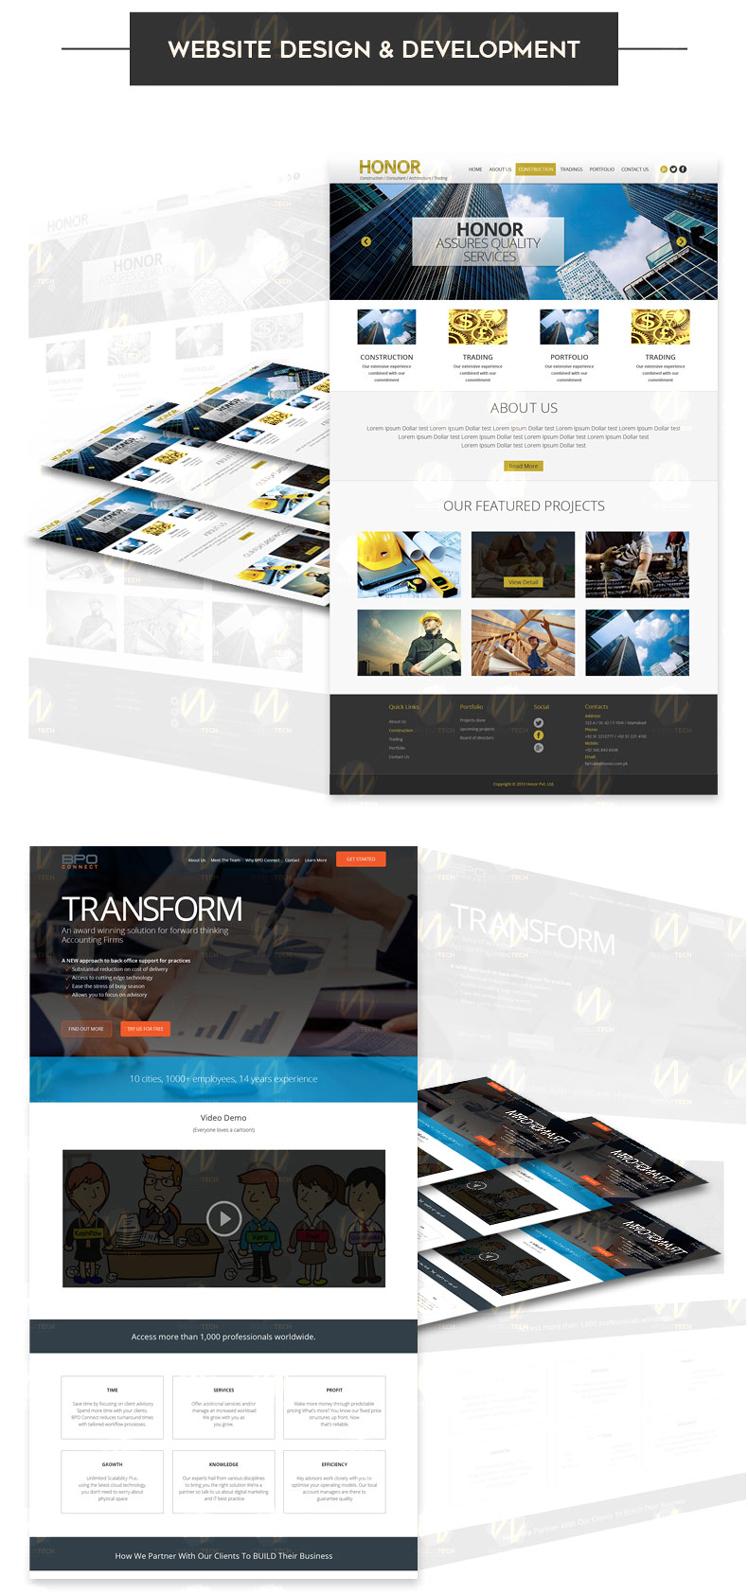 website design and development by weblotech an affordable web design agency